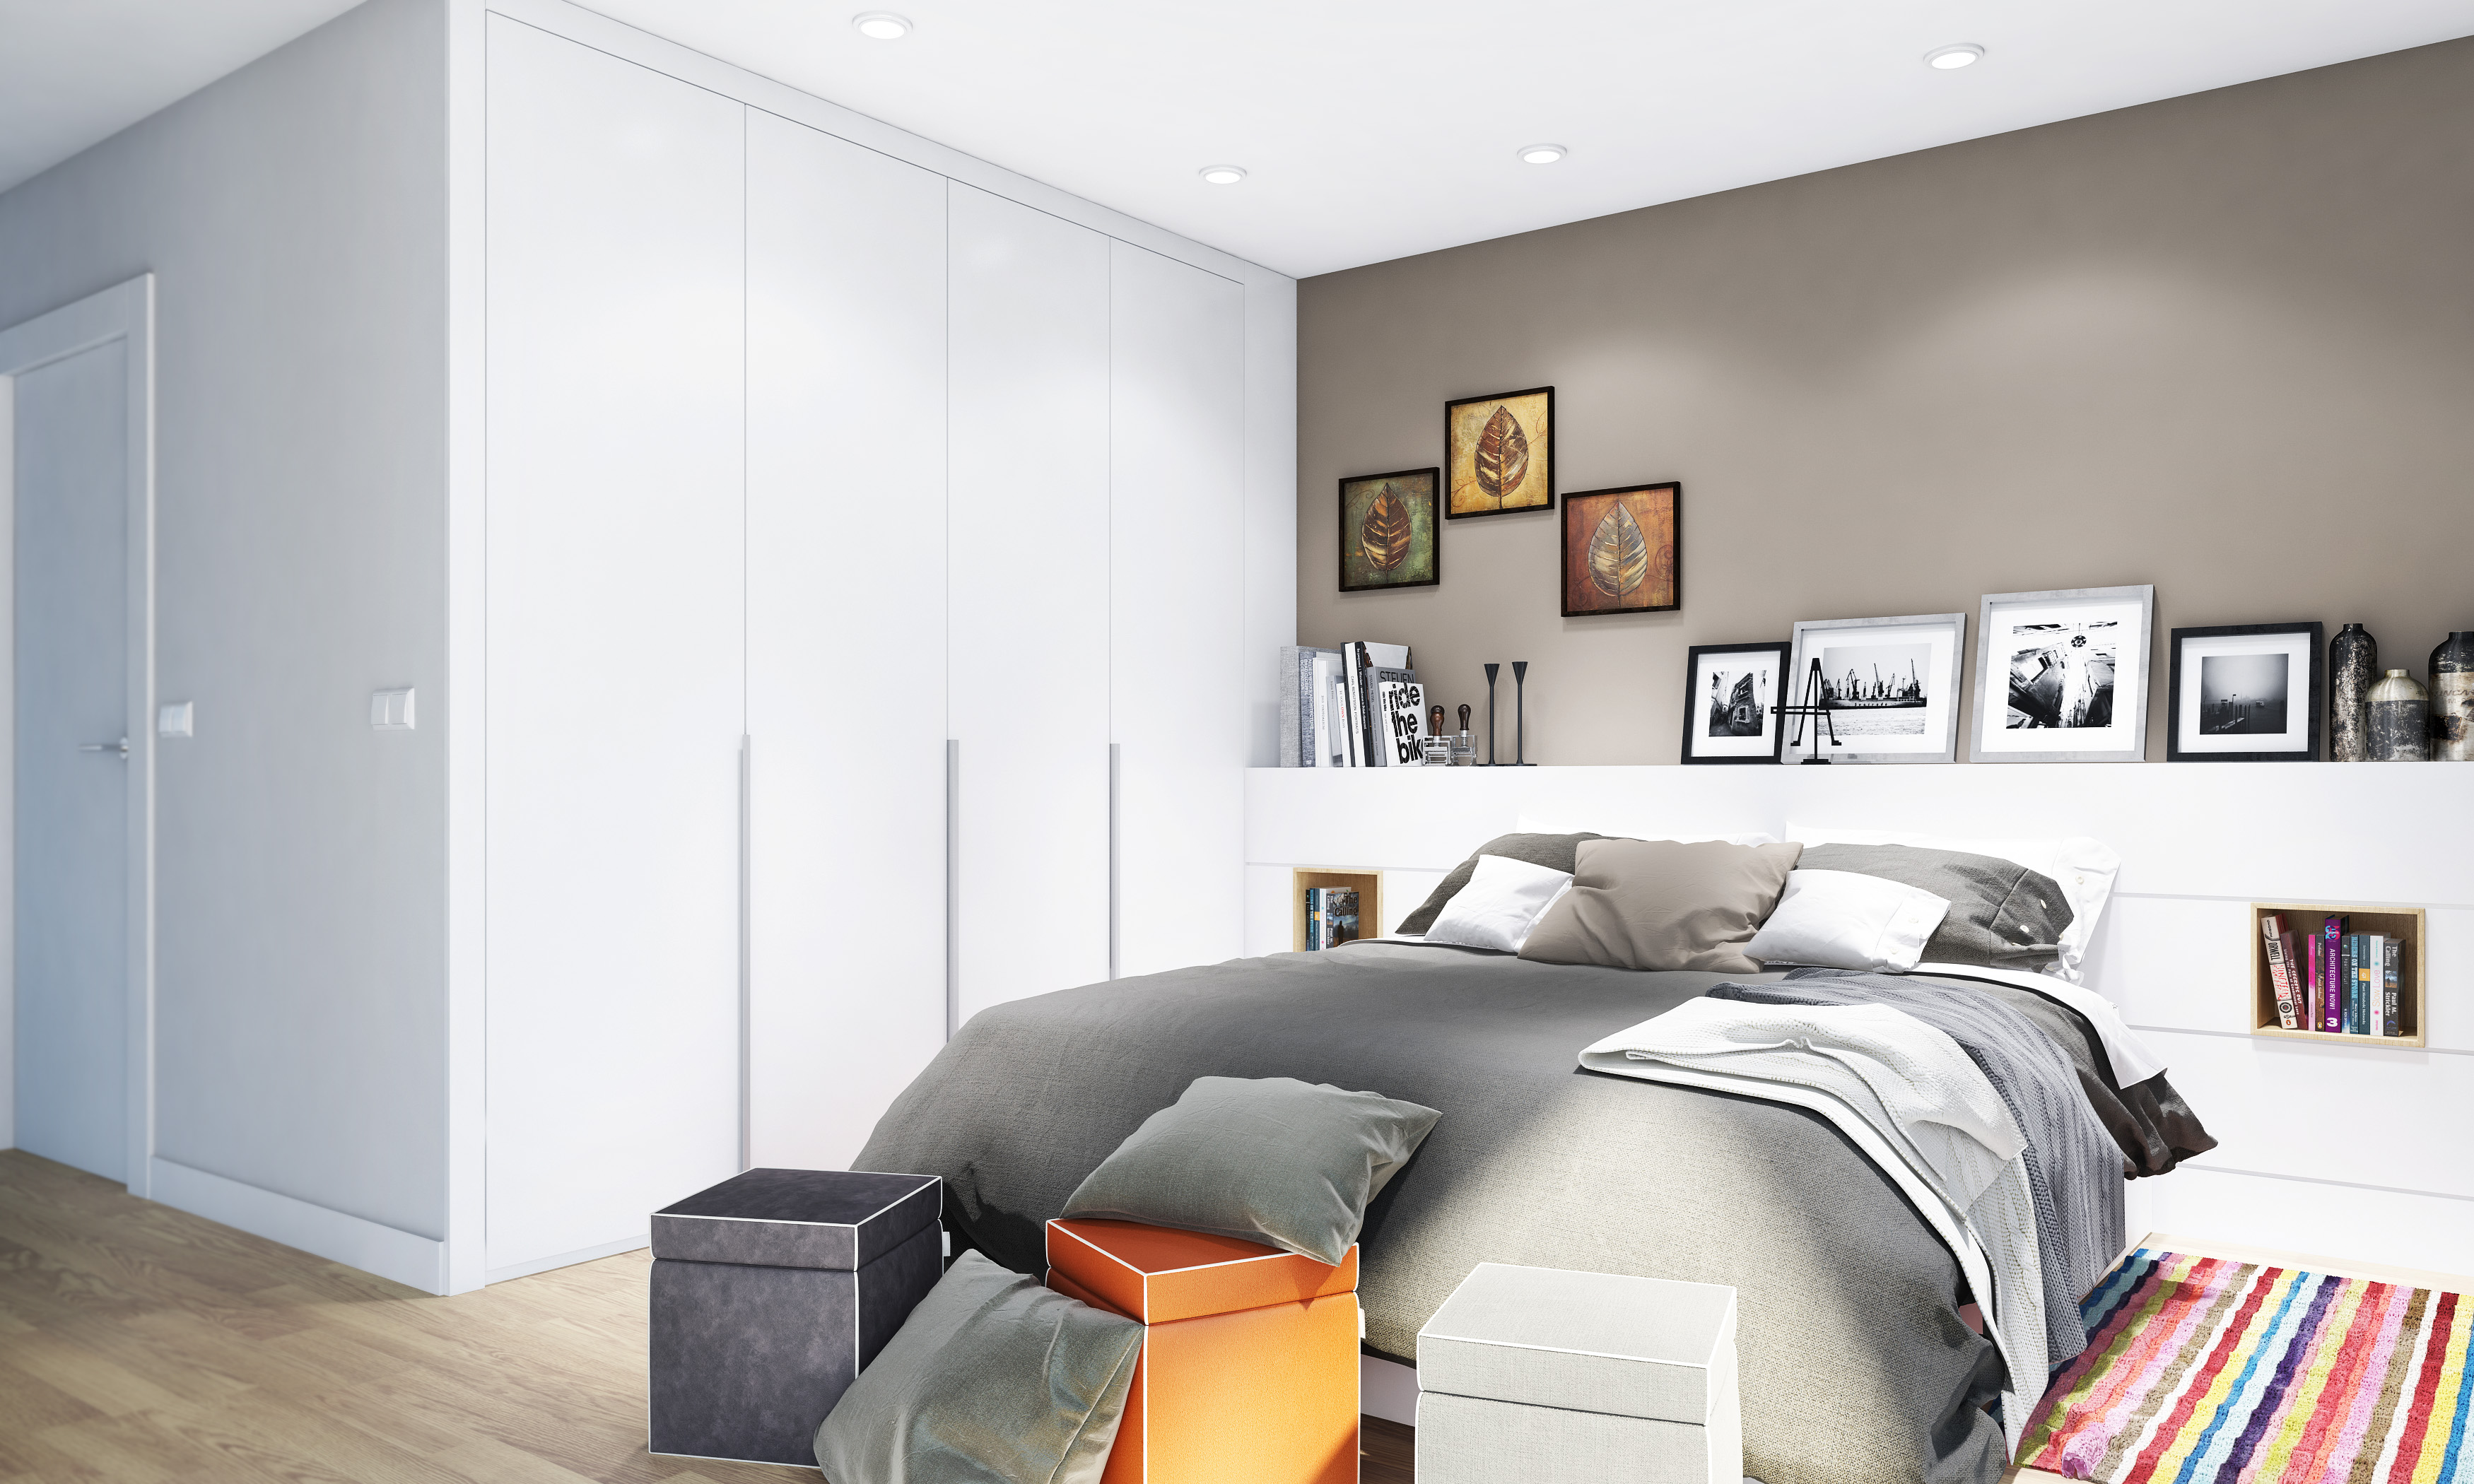 abaigar_Ripagaina_h21_dormitorio